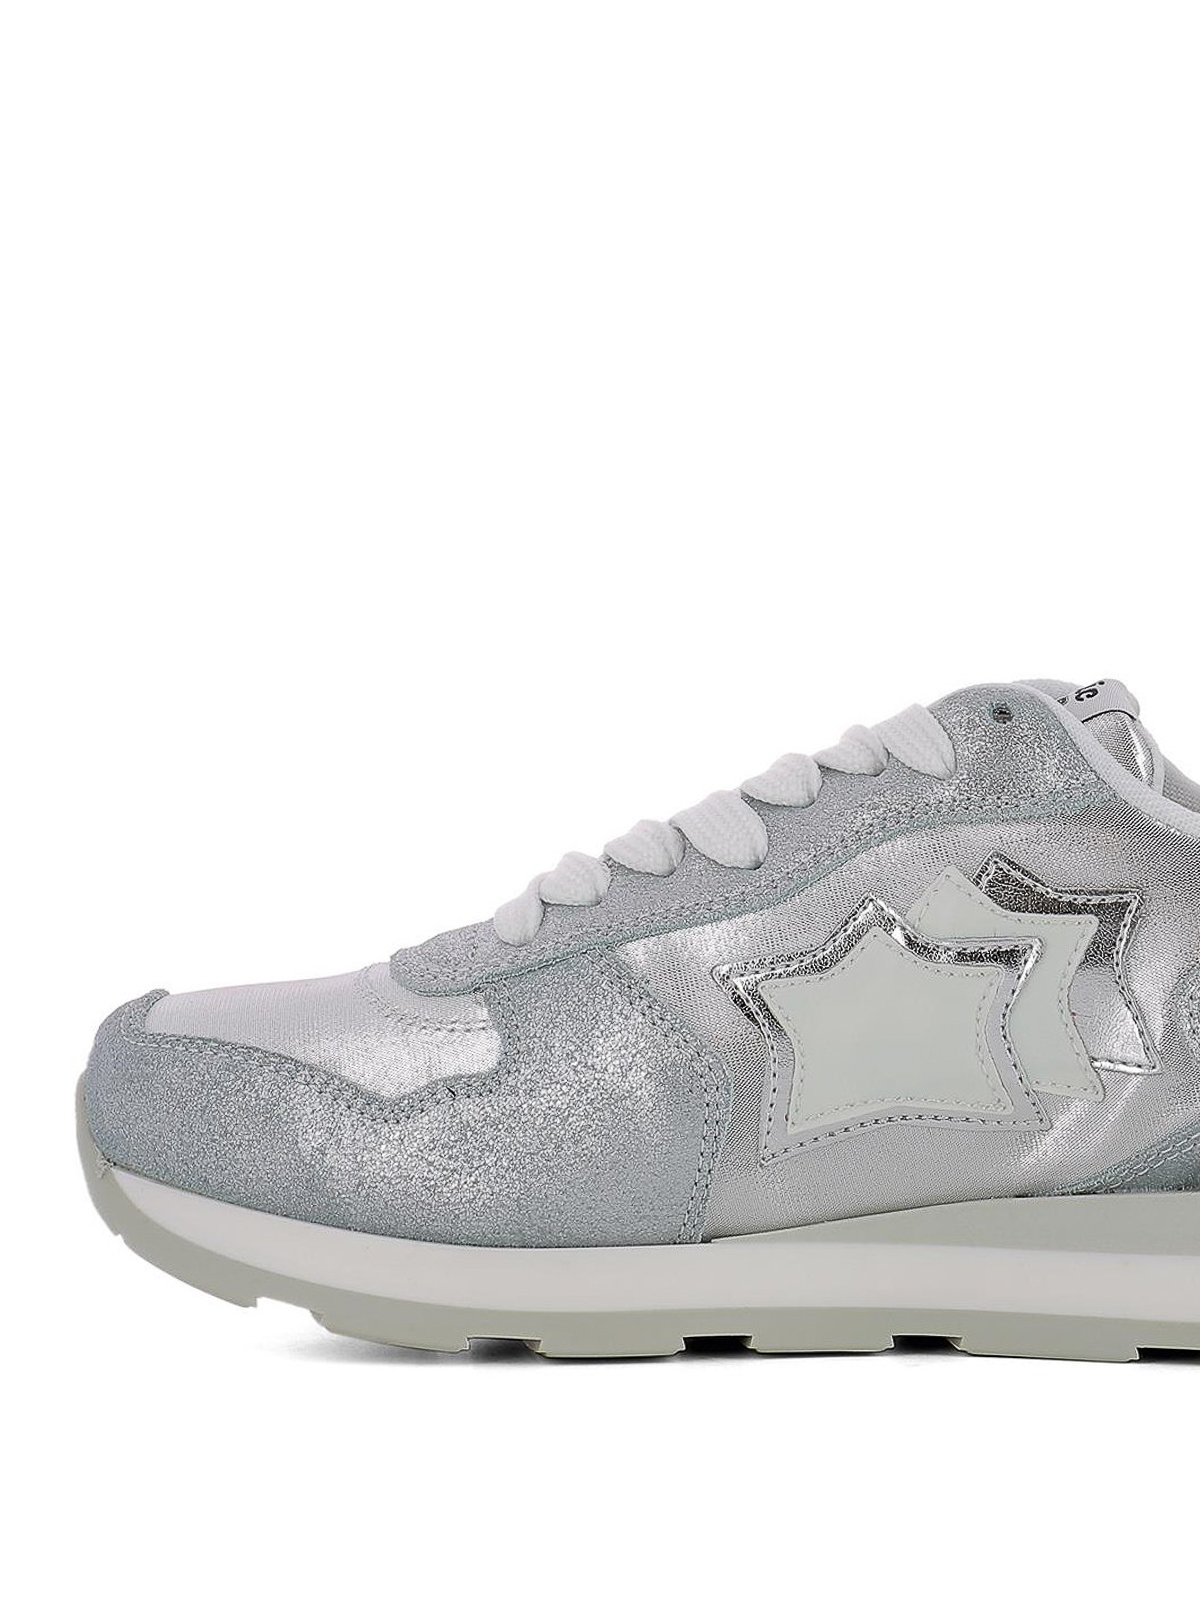 Atlantic Stars - Vega silver sneakers - trainers - VEGA CAA 86B